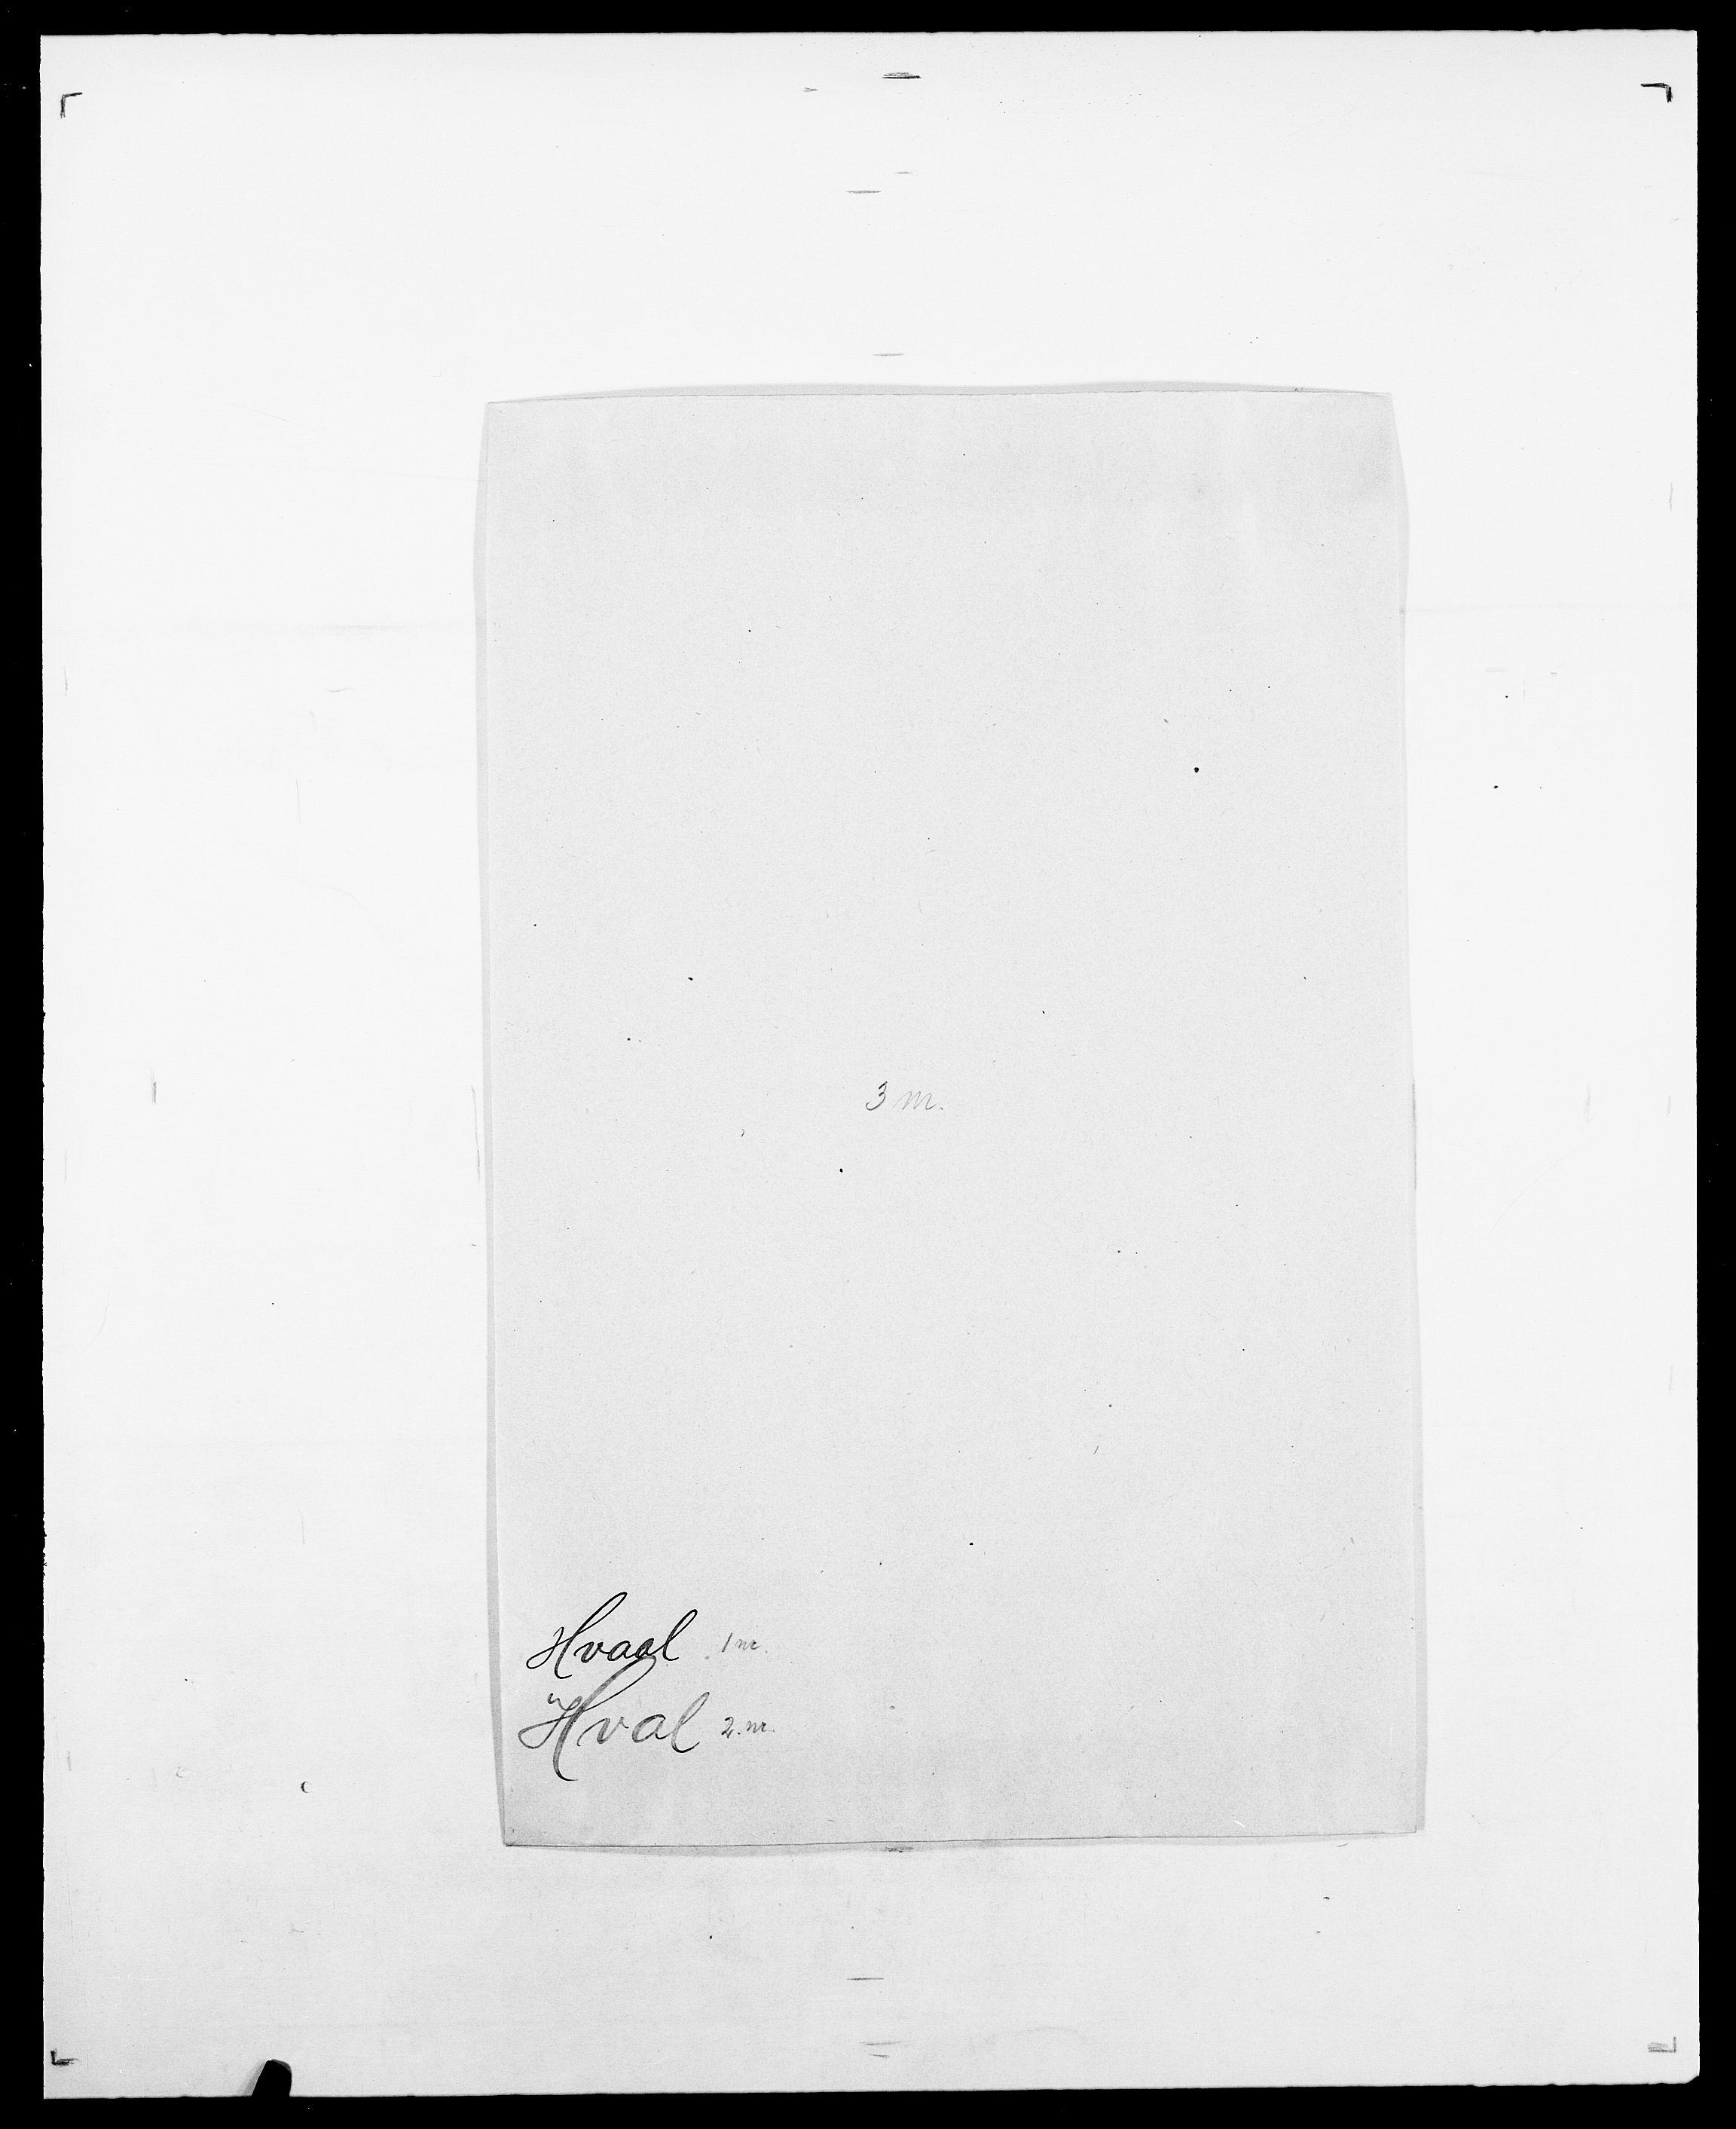 SAO, Delgobe, Charles Antoine - samling, D/Da/L0019: van der Hude - Joys, s. 112